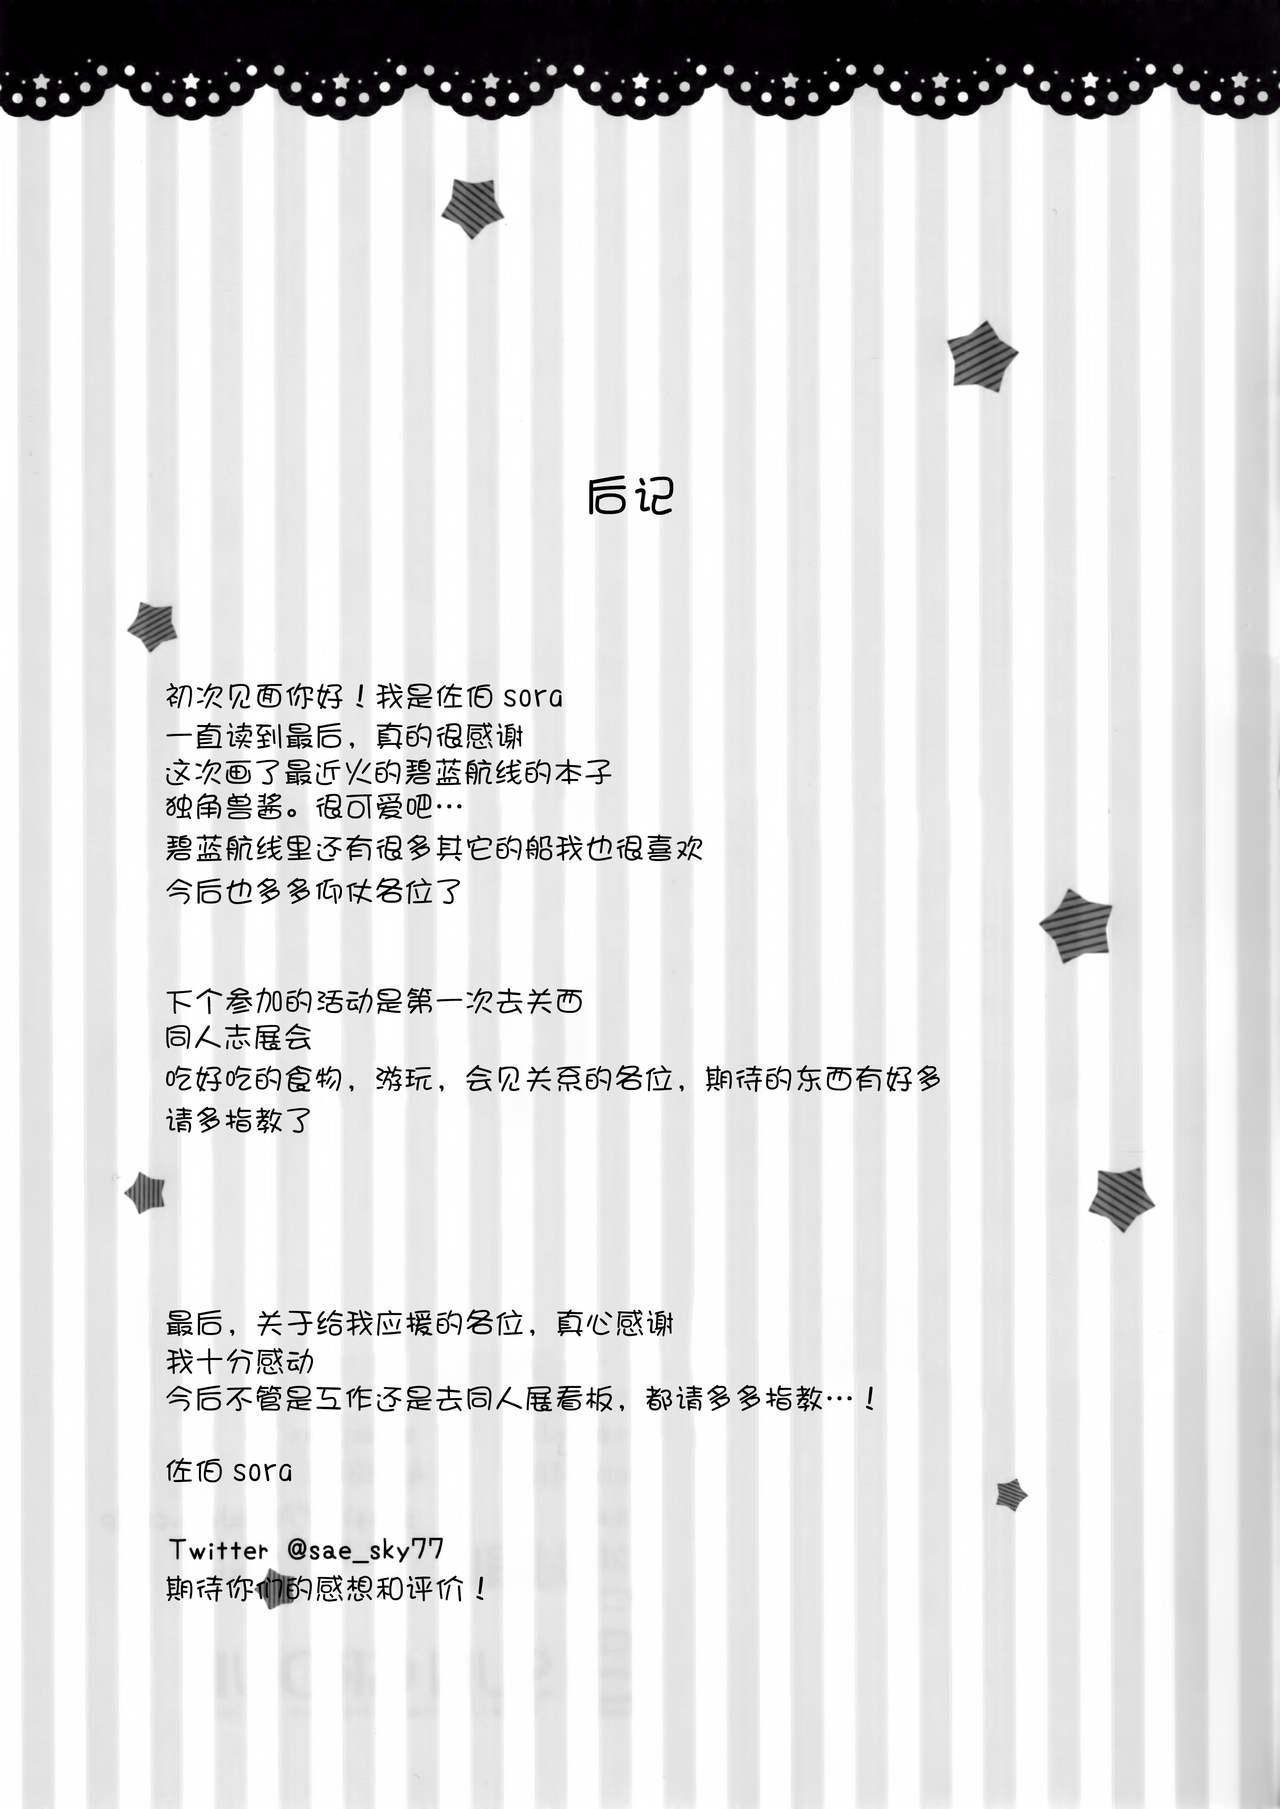 Onii-chan Unicorn to Iikoto... Suru? | 哥哥 和独角兽 做点舒服的...事情吧? 16